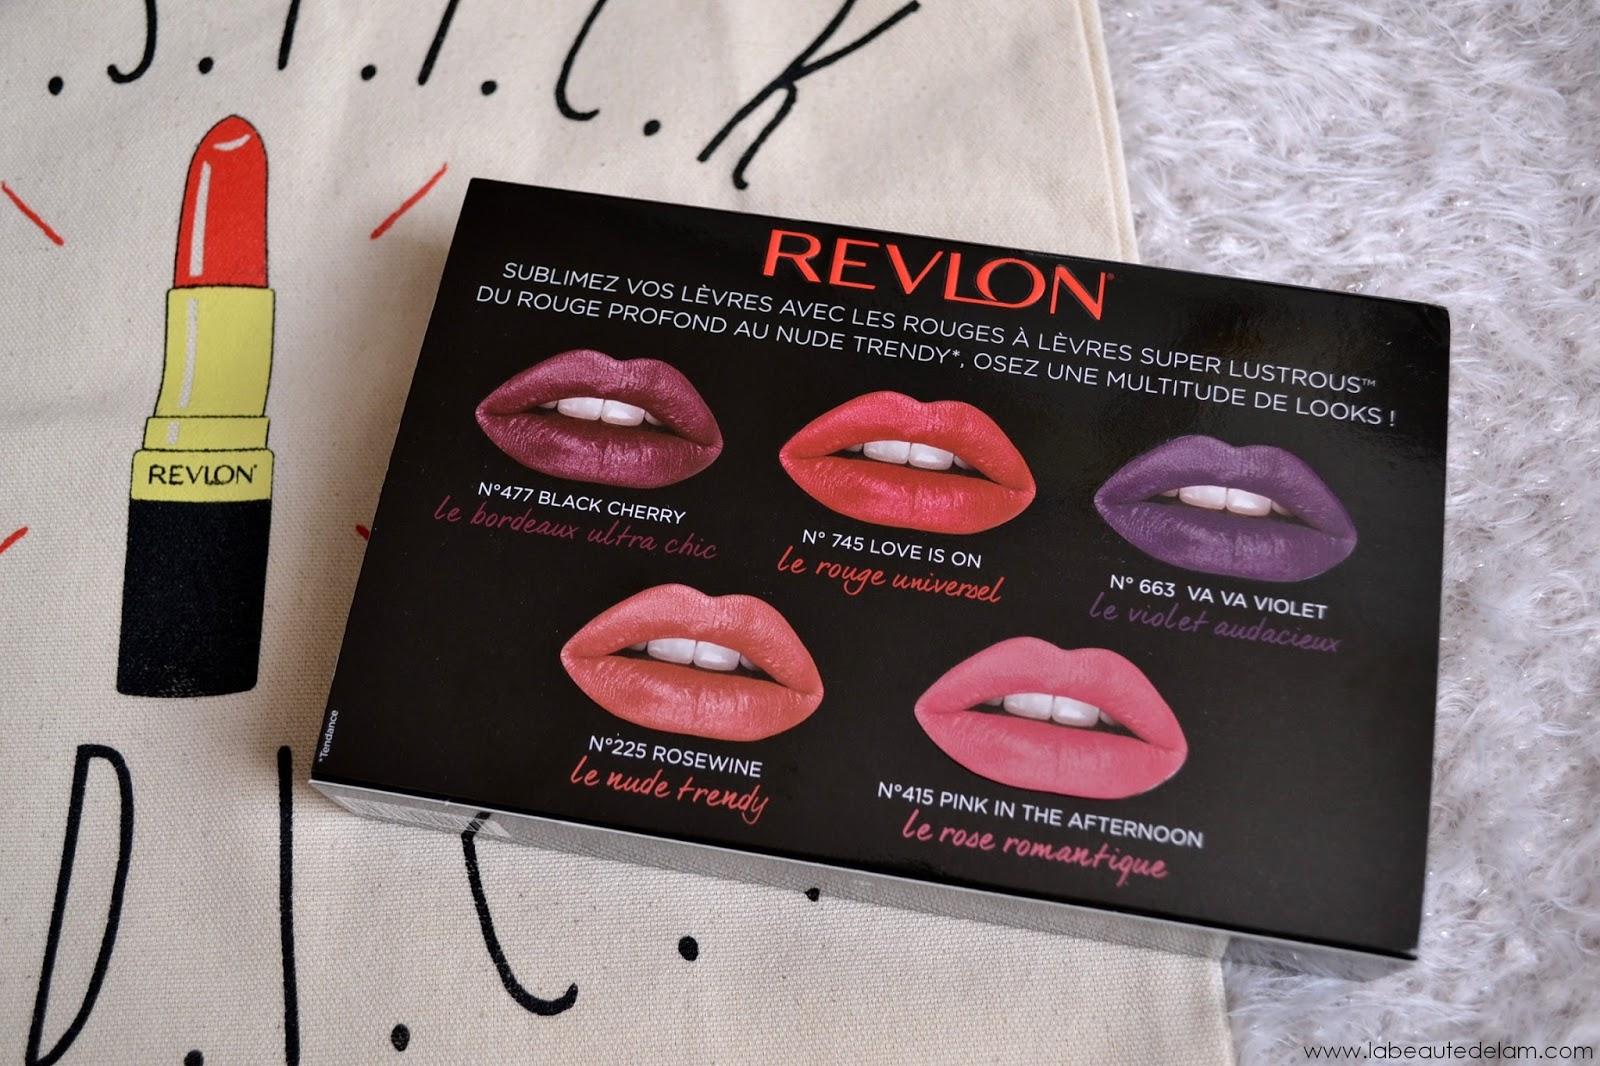 Harga Jual Revlon Super Lustrous Lipstick Love Is On 745 Terbaru Hello Nuku Seville Pink Mules Heels Merah Muda 36 La Beaut De Lm Blog Bien Tre Culture Et Gourmandise